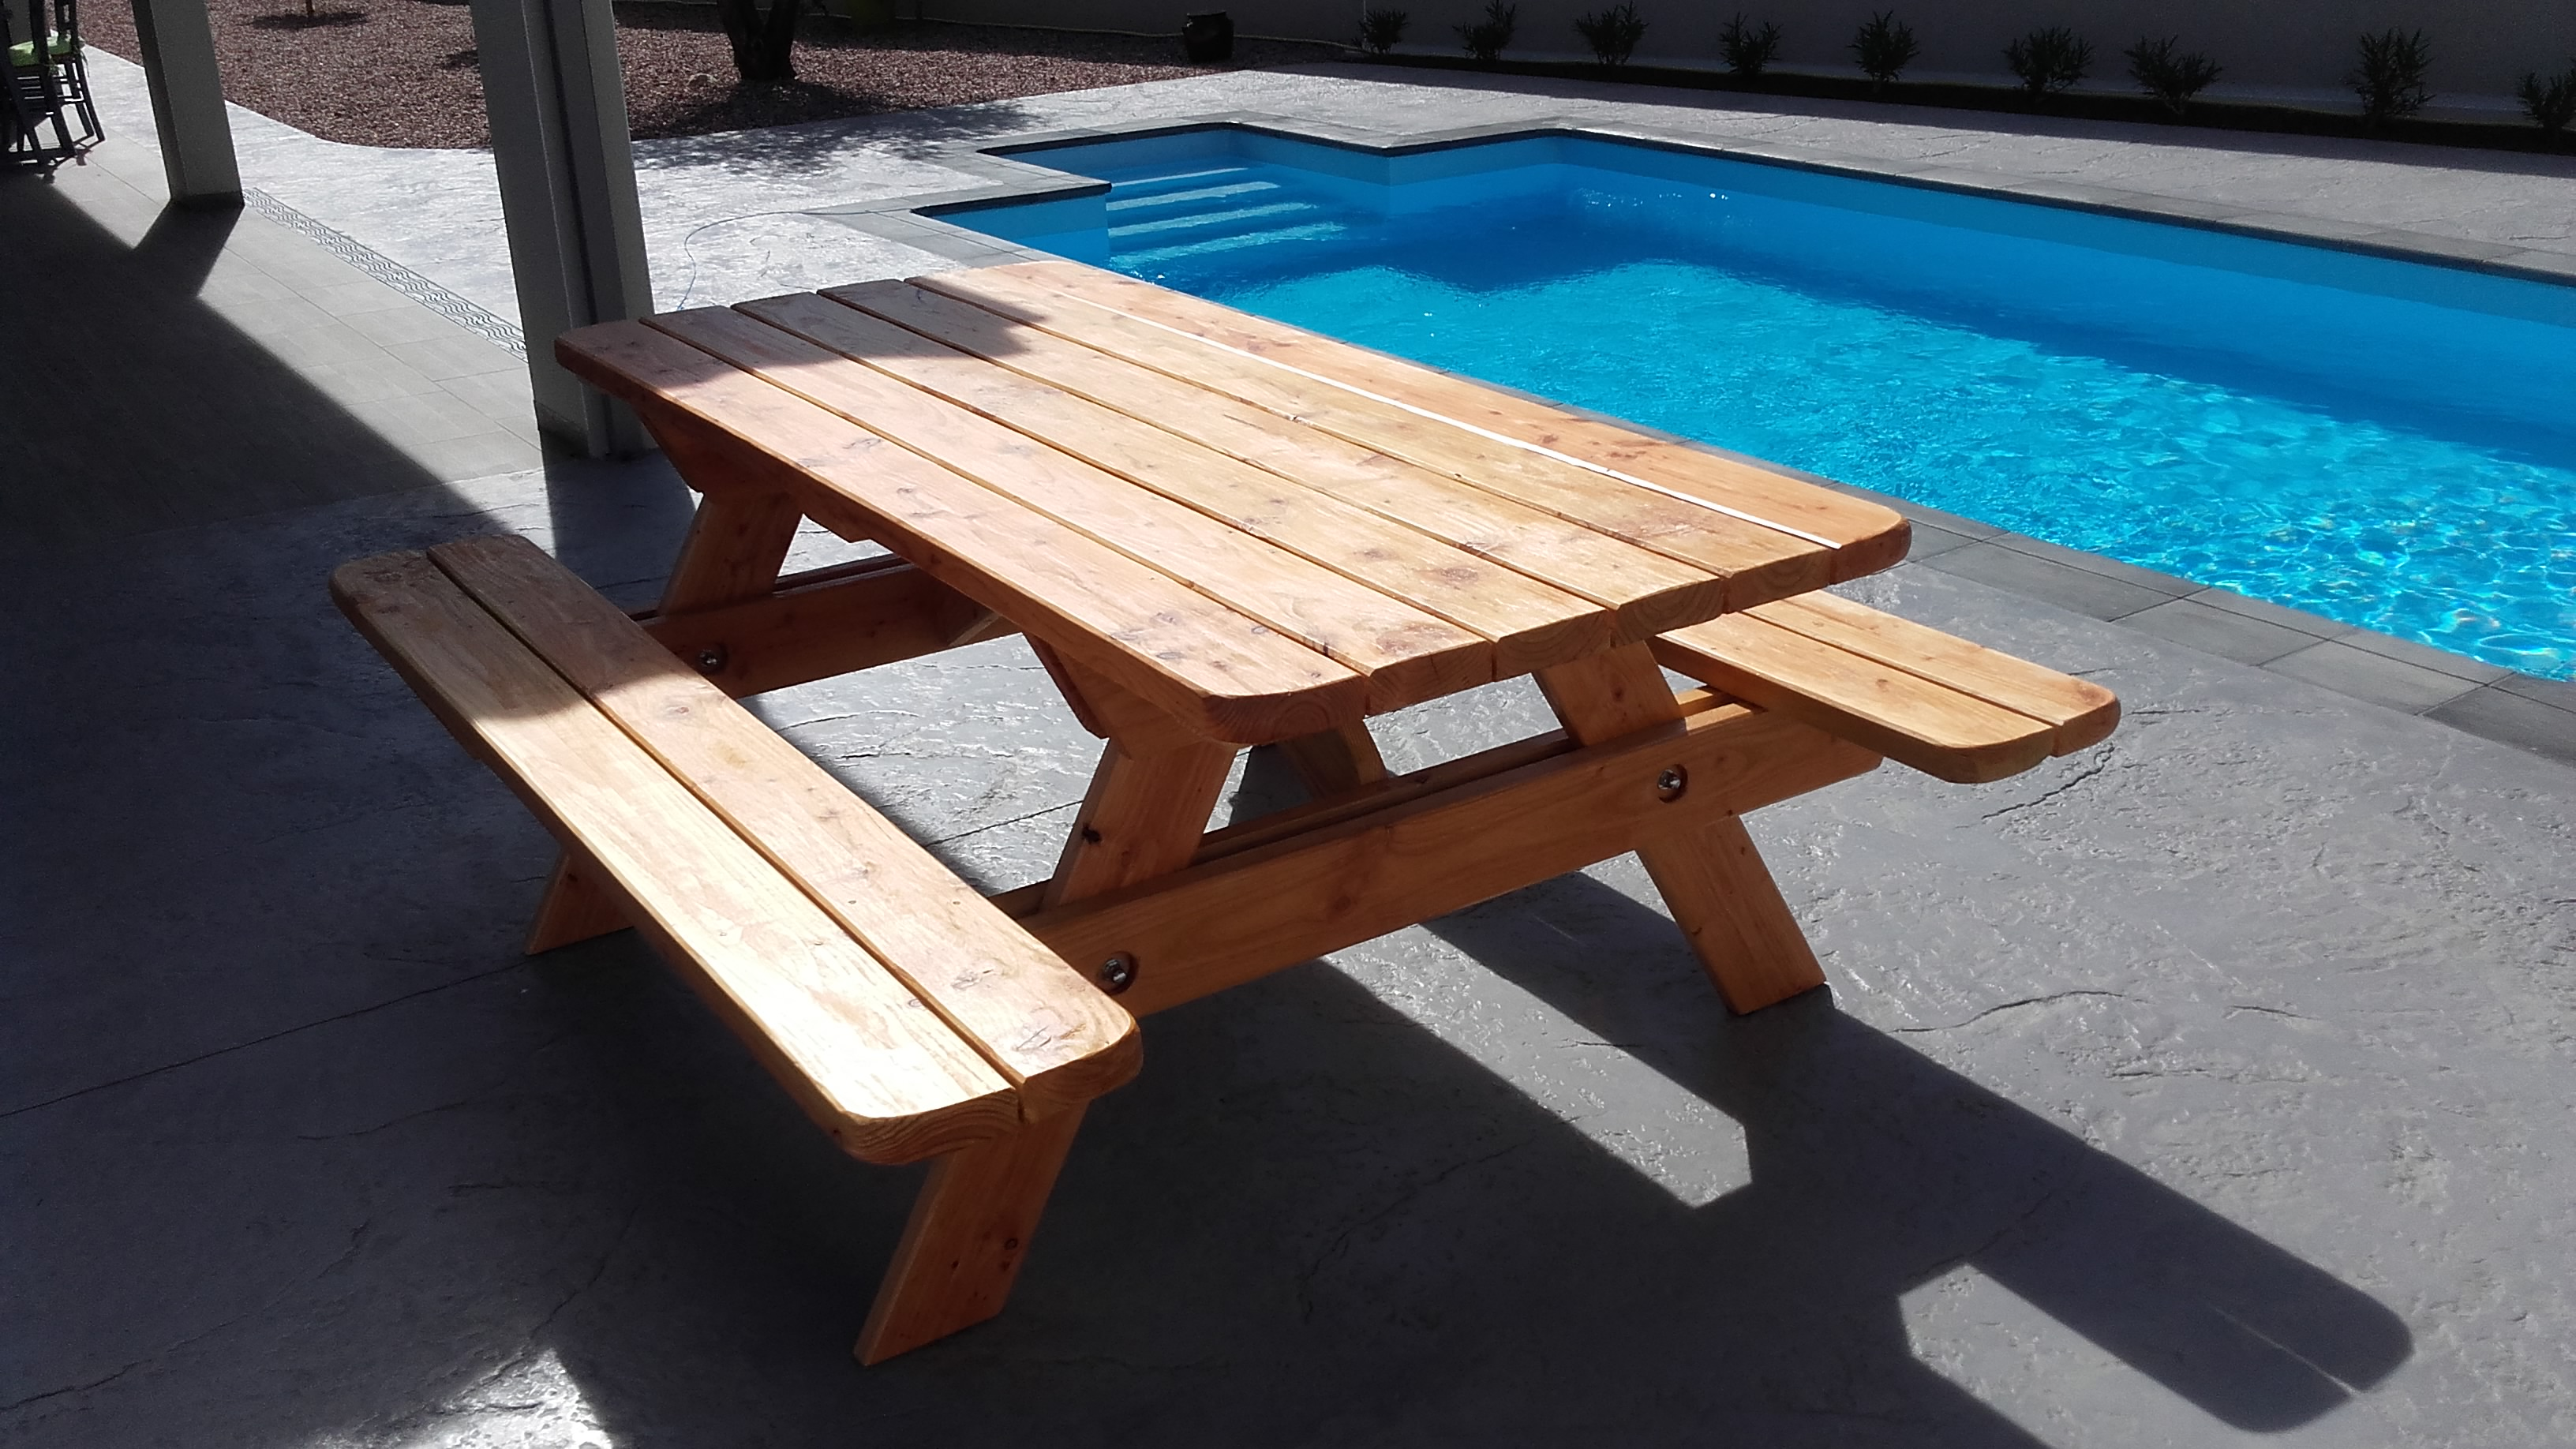 VIALA BOIS - Mobilier de jardin en bois - Table forestière ...